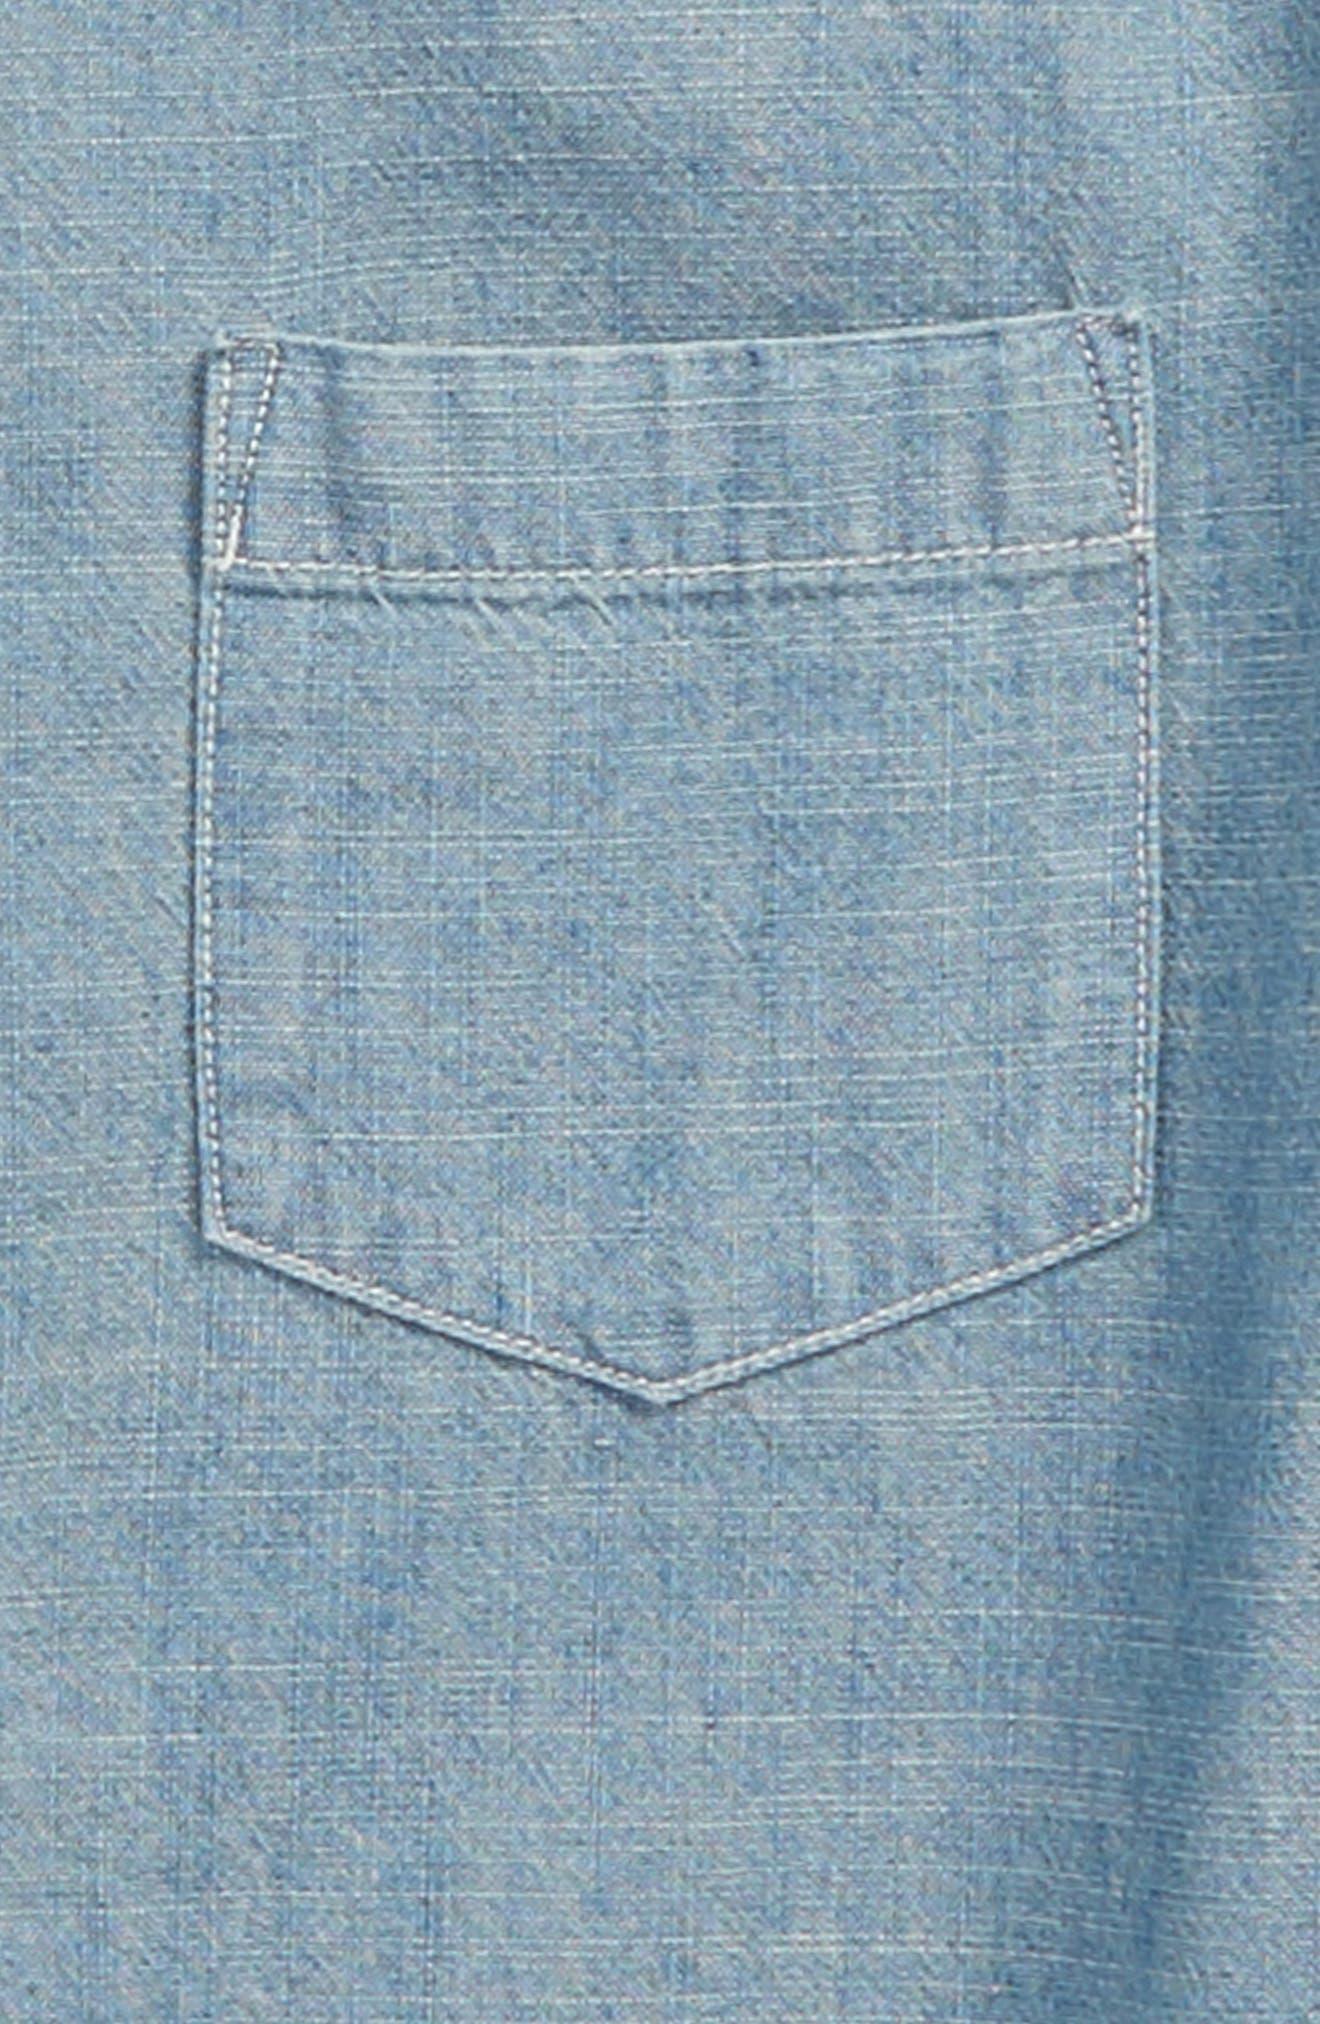 Chambray Woven Shirt,                             Alternate thumbnail 2, color,